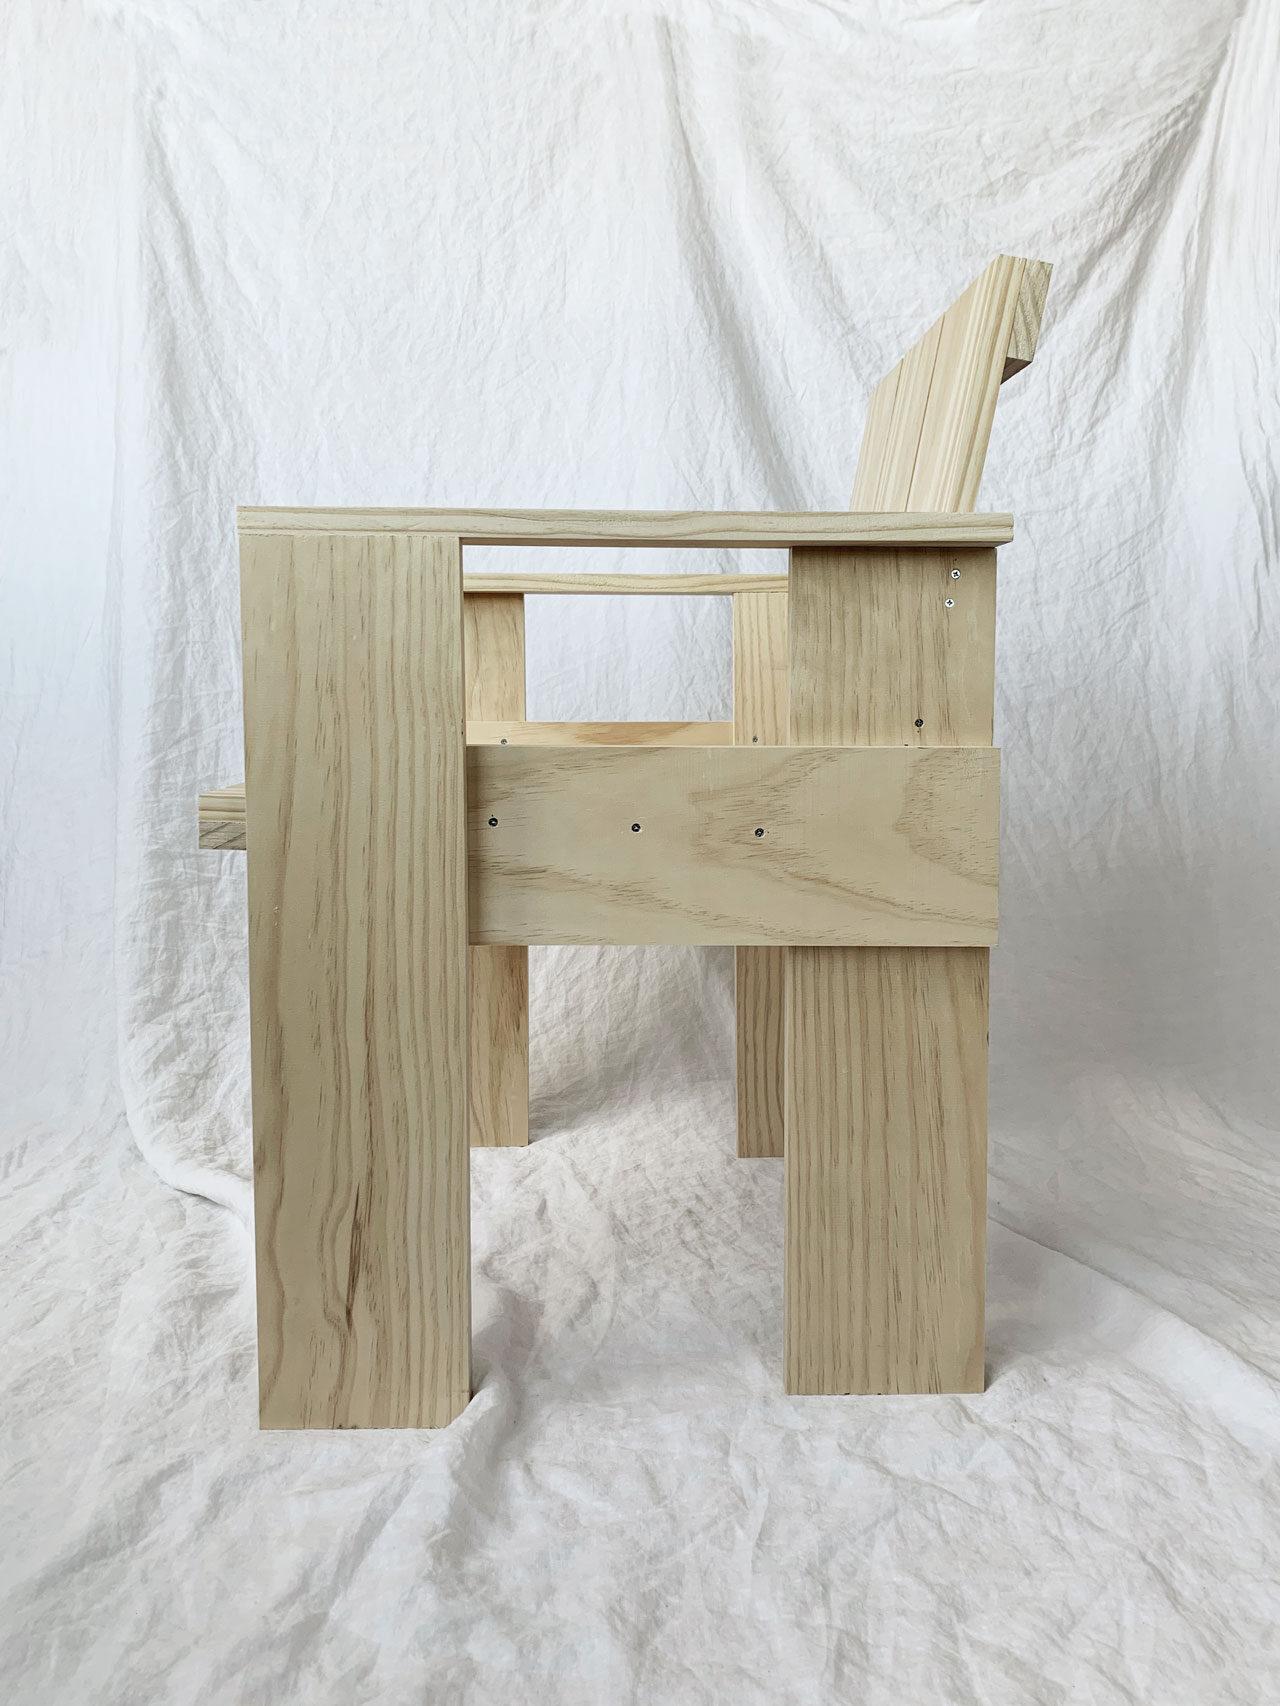 Crate Chair DIY by Gerrit Rietveld